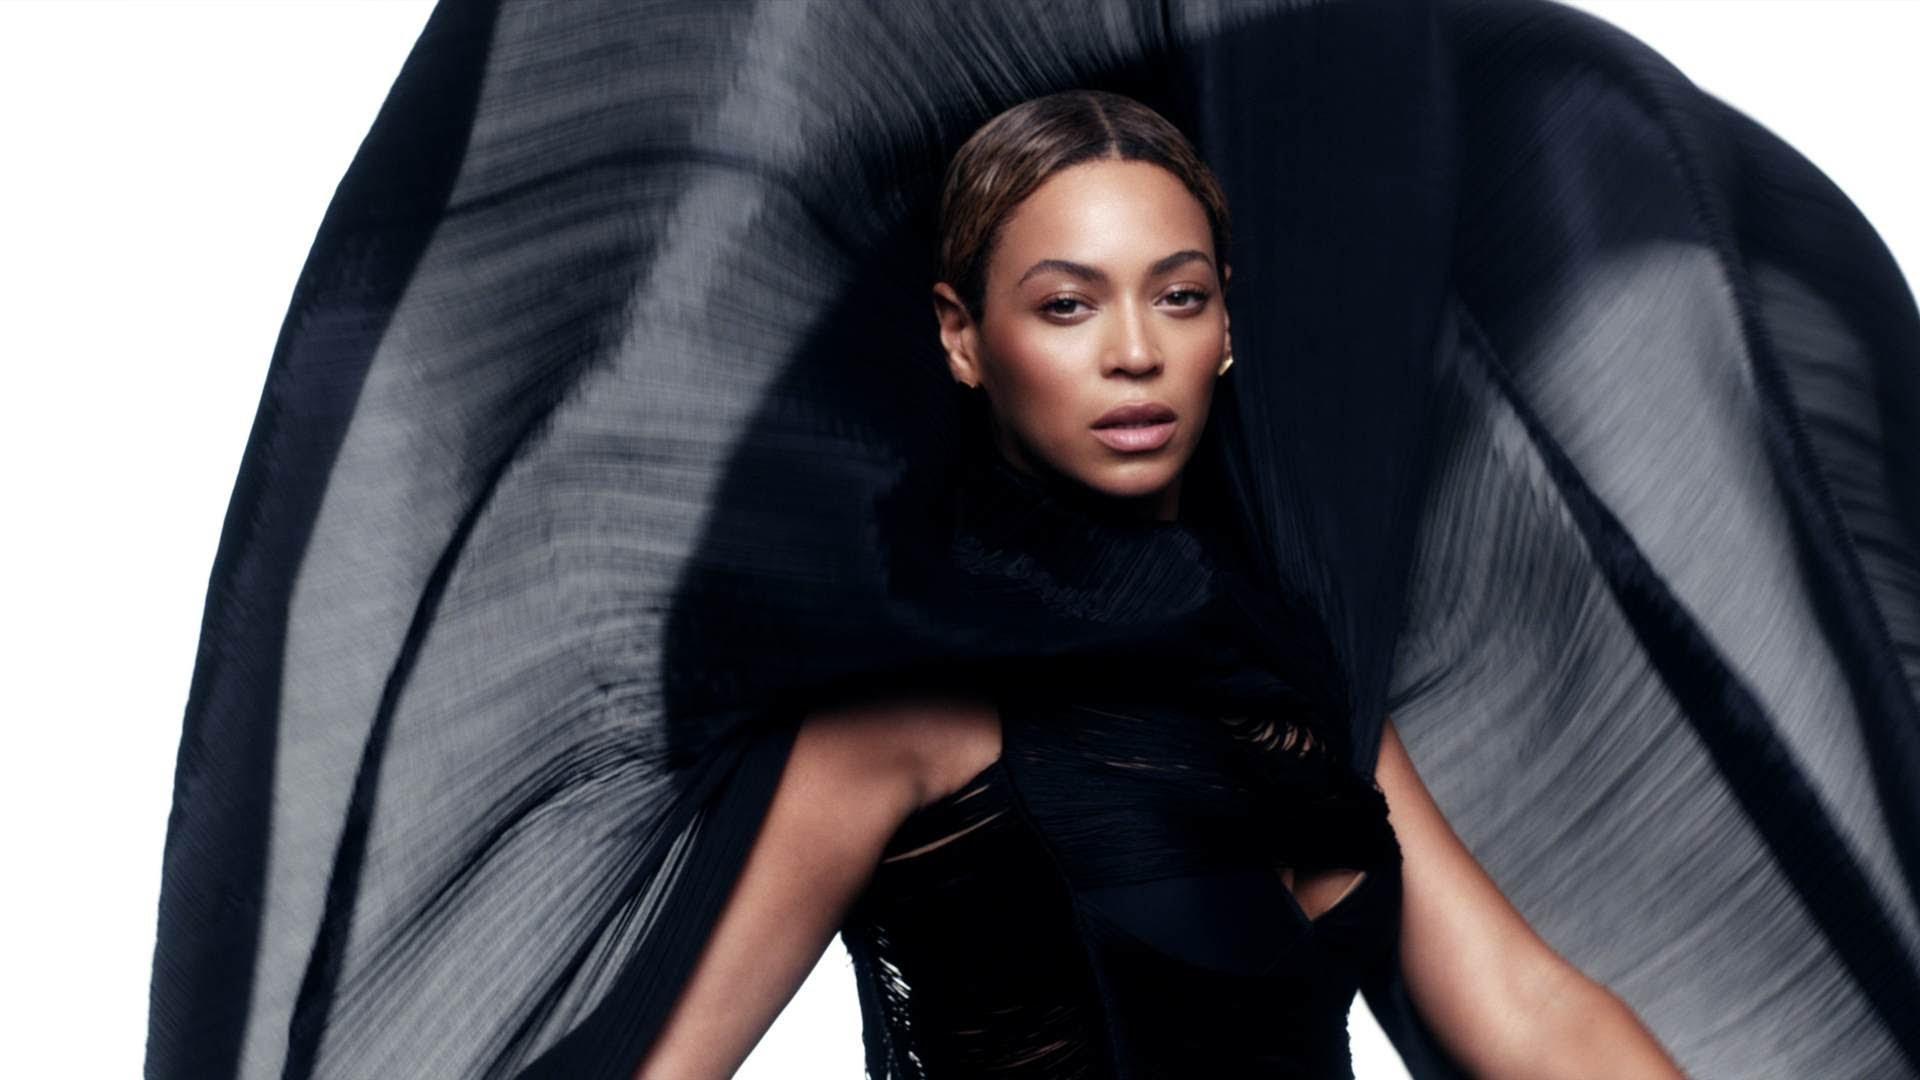 Zato je zovu Queen B: Beyonce objavila novi album sa 14 novih pjesama i 17 spota